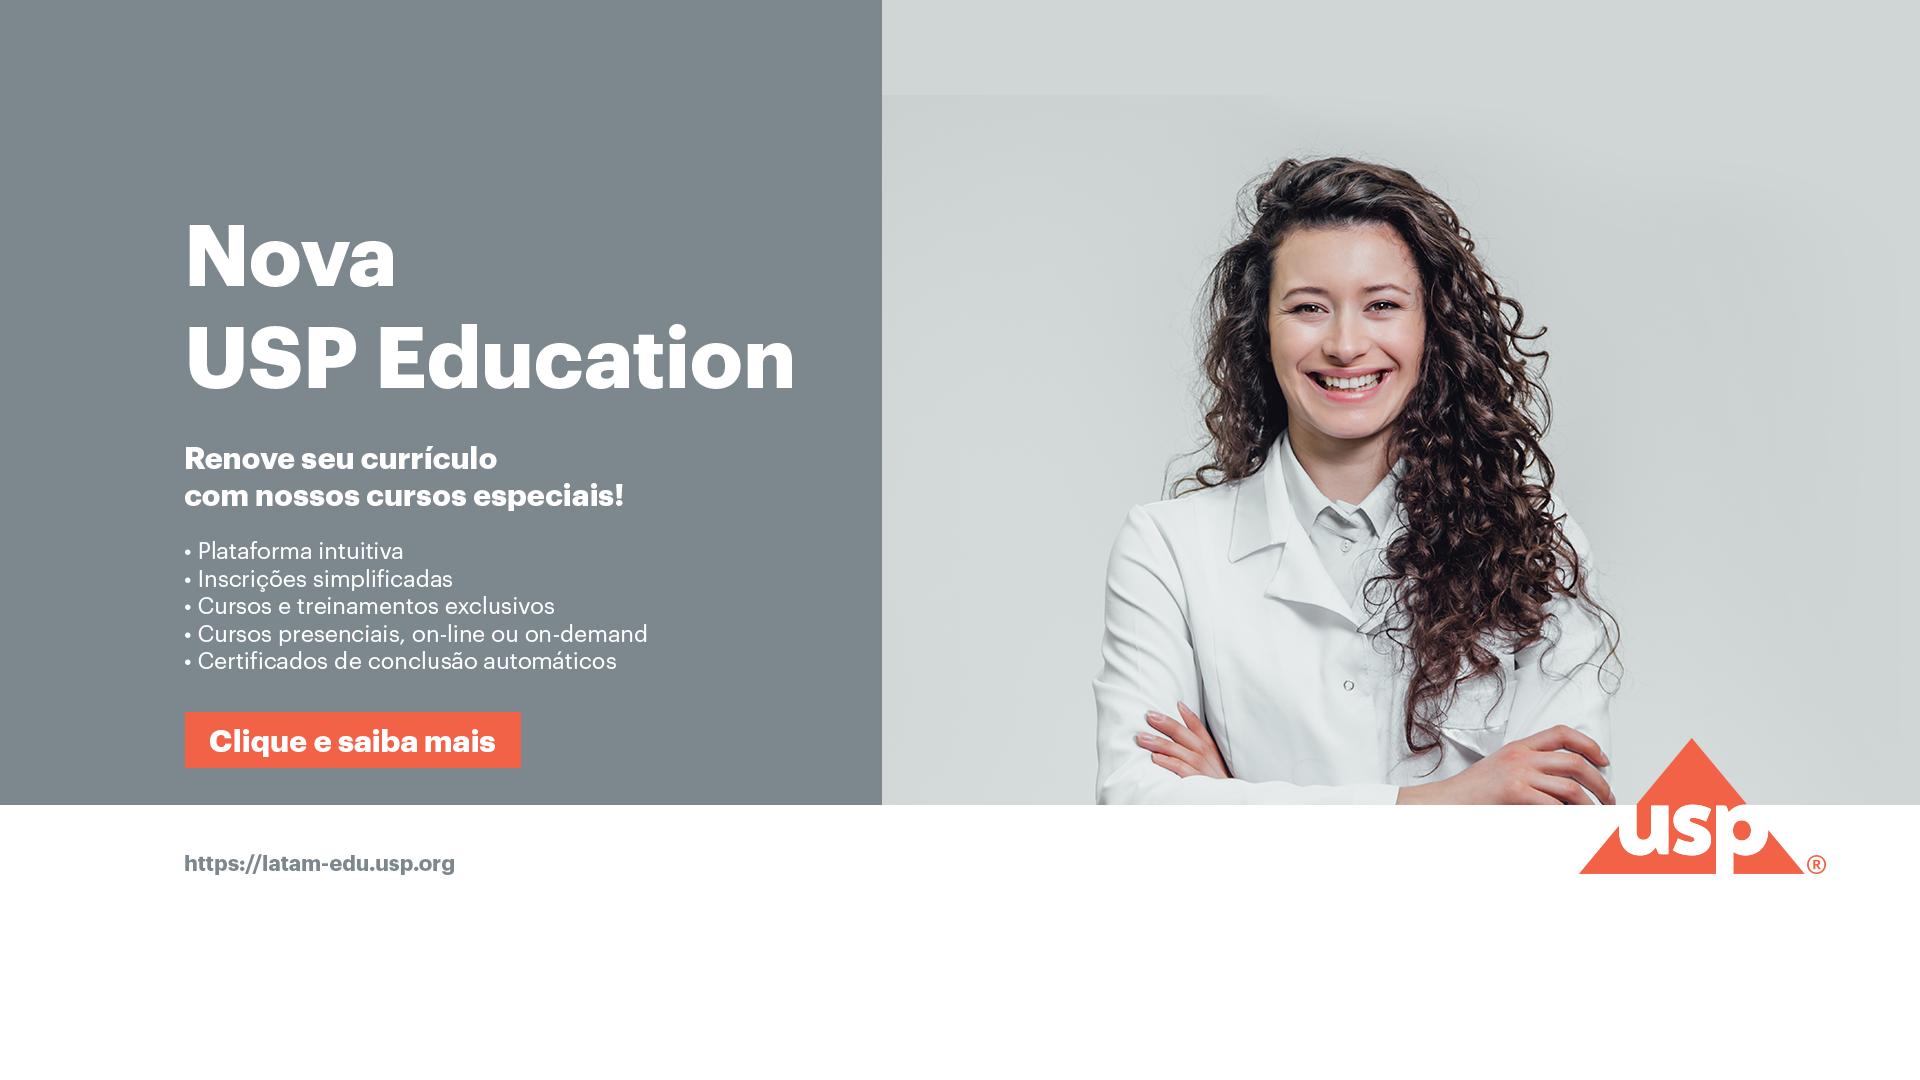 BANNER_NOVA USP EDUCATION_PORT